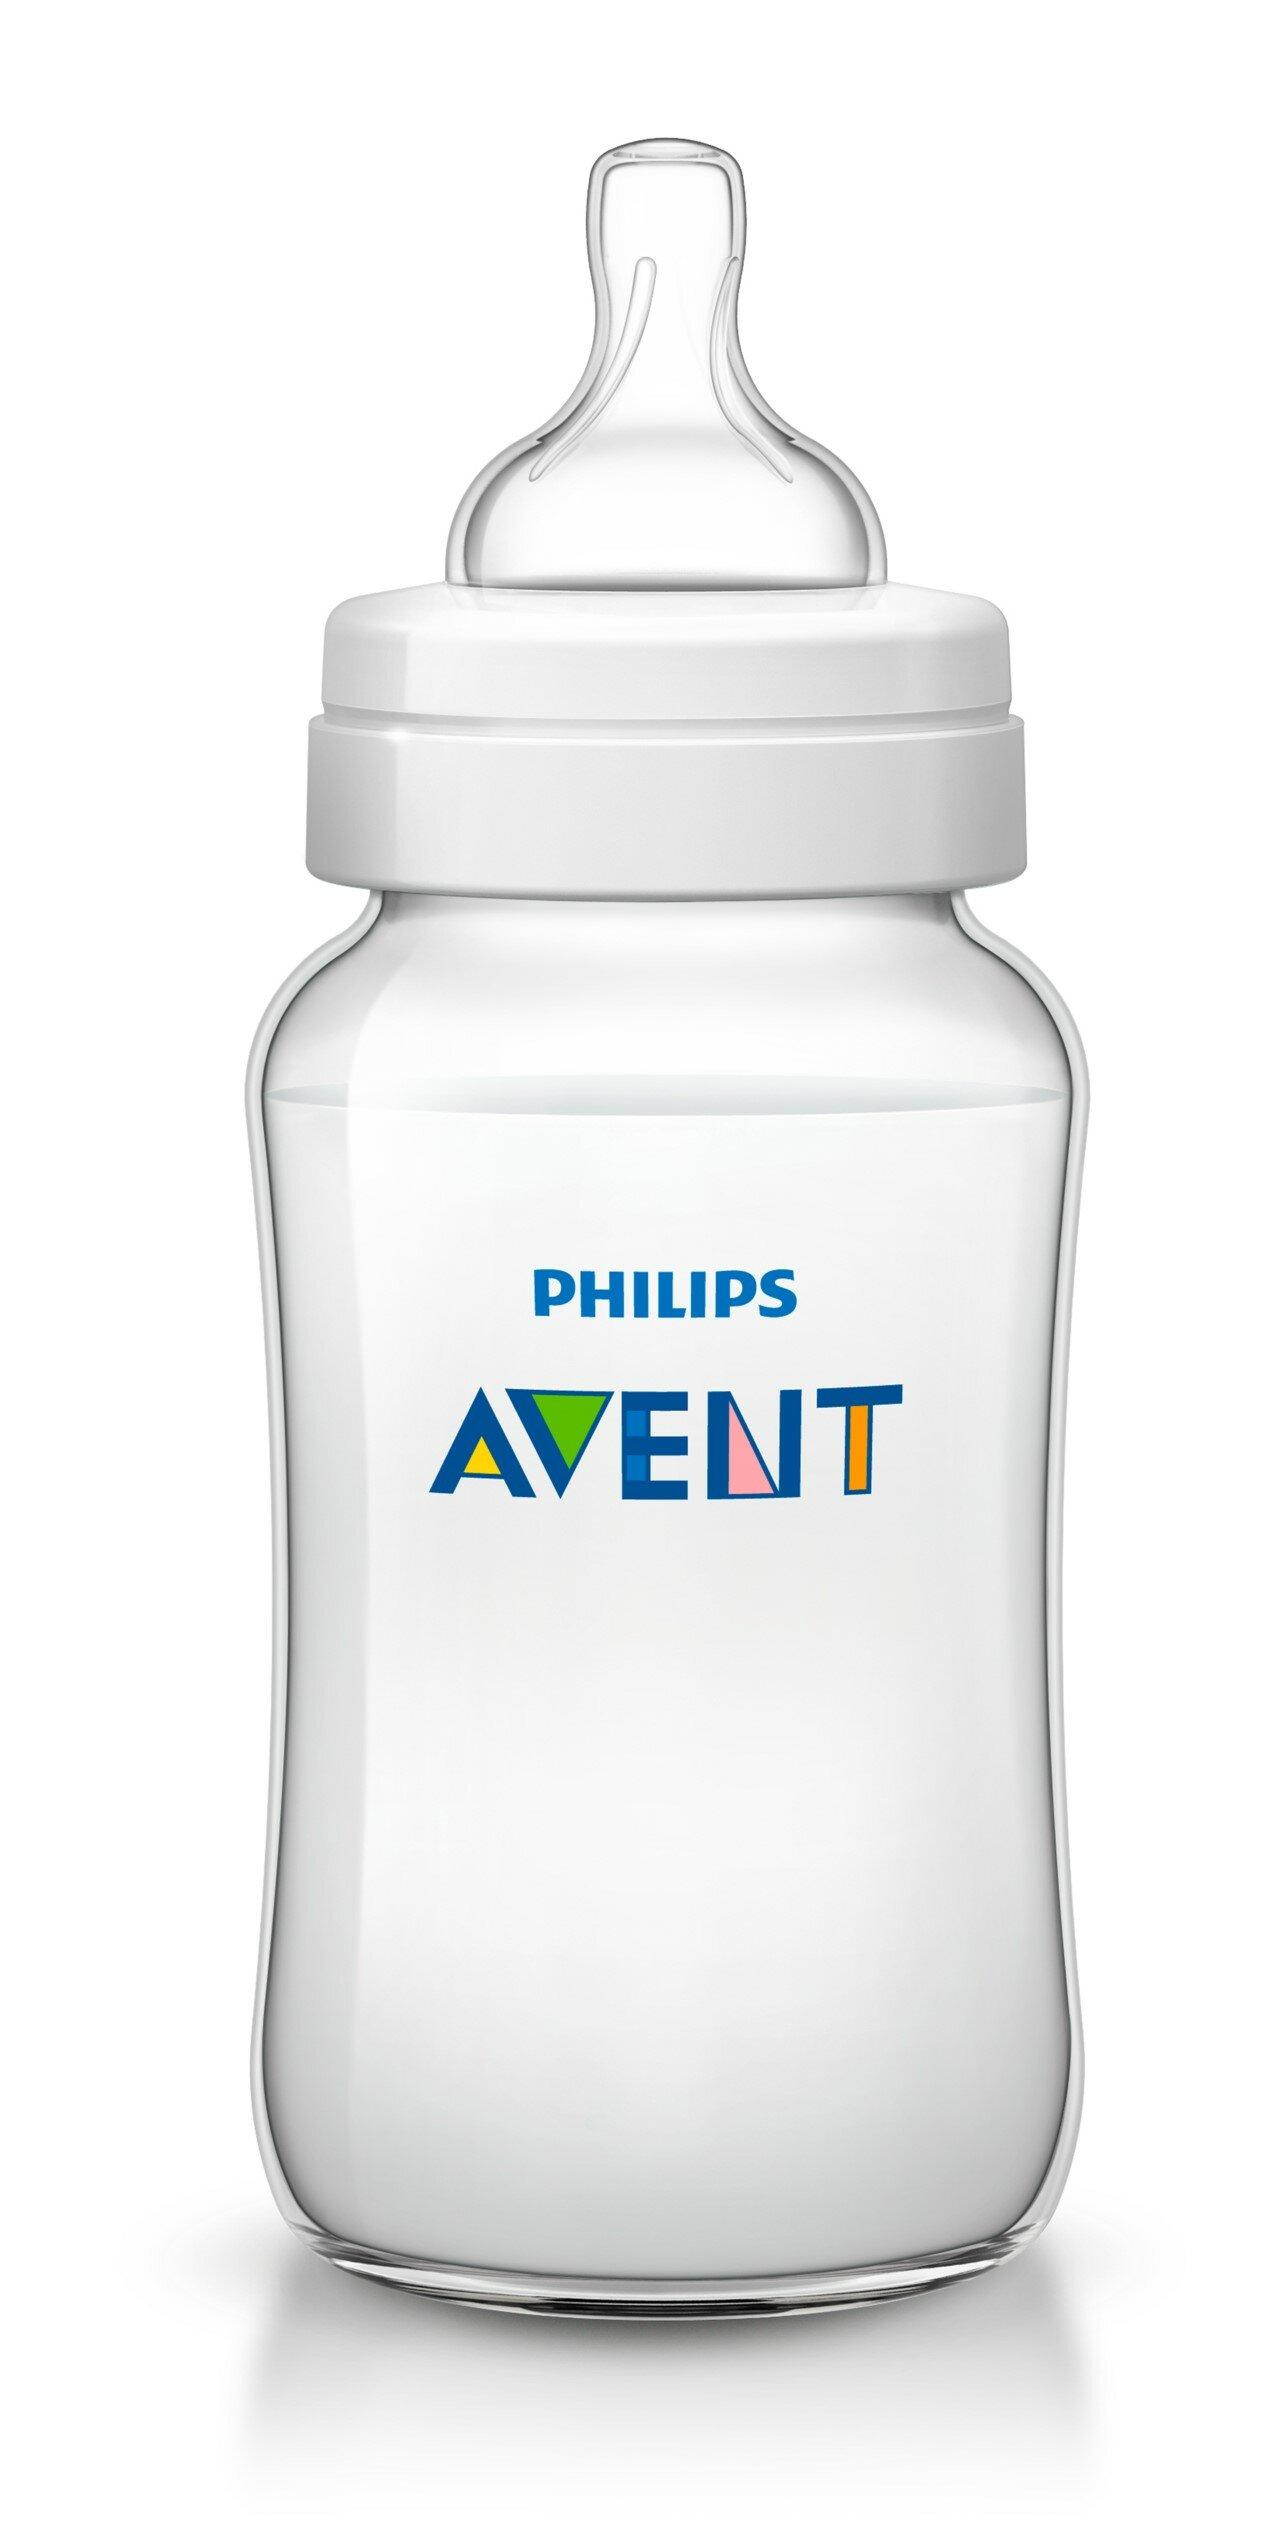 Philips AVENT Бутылочка полипропиленовая Classic+ SCF566/17, 330 мл с 3 мес.